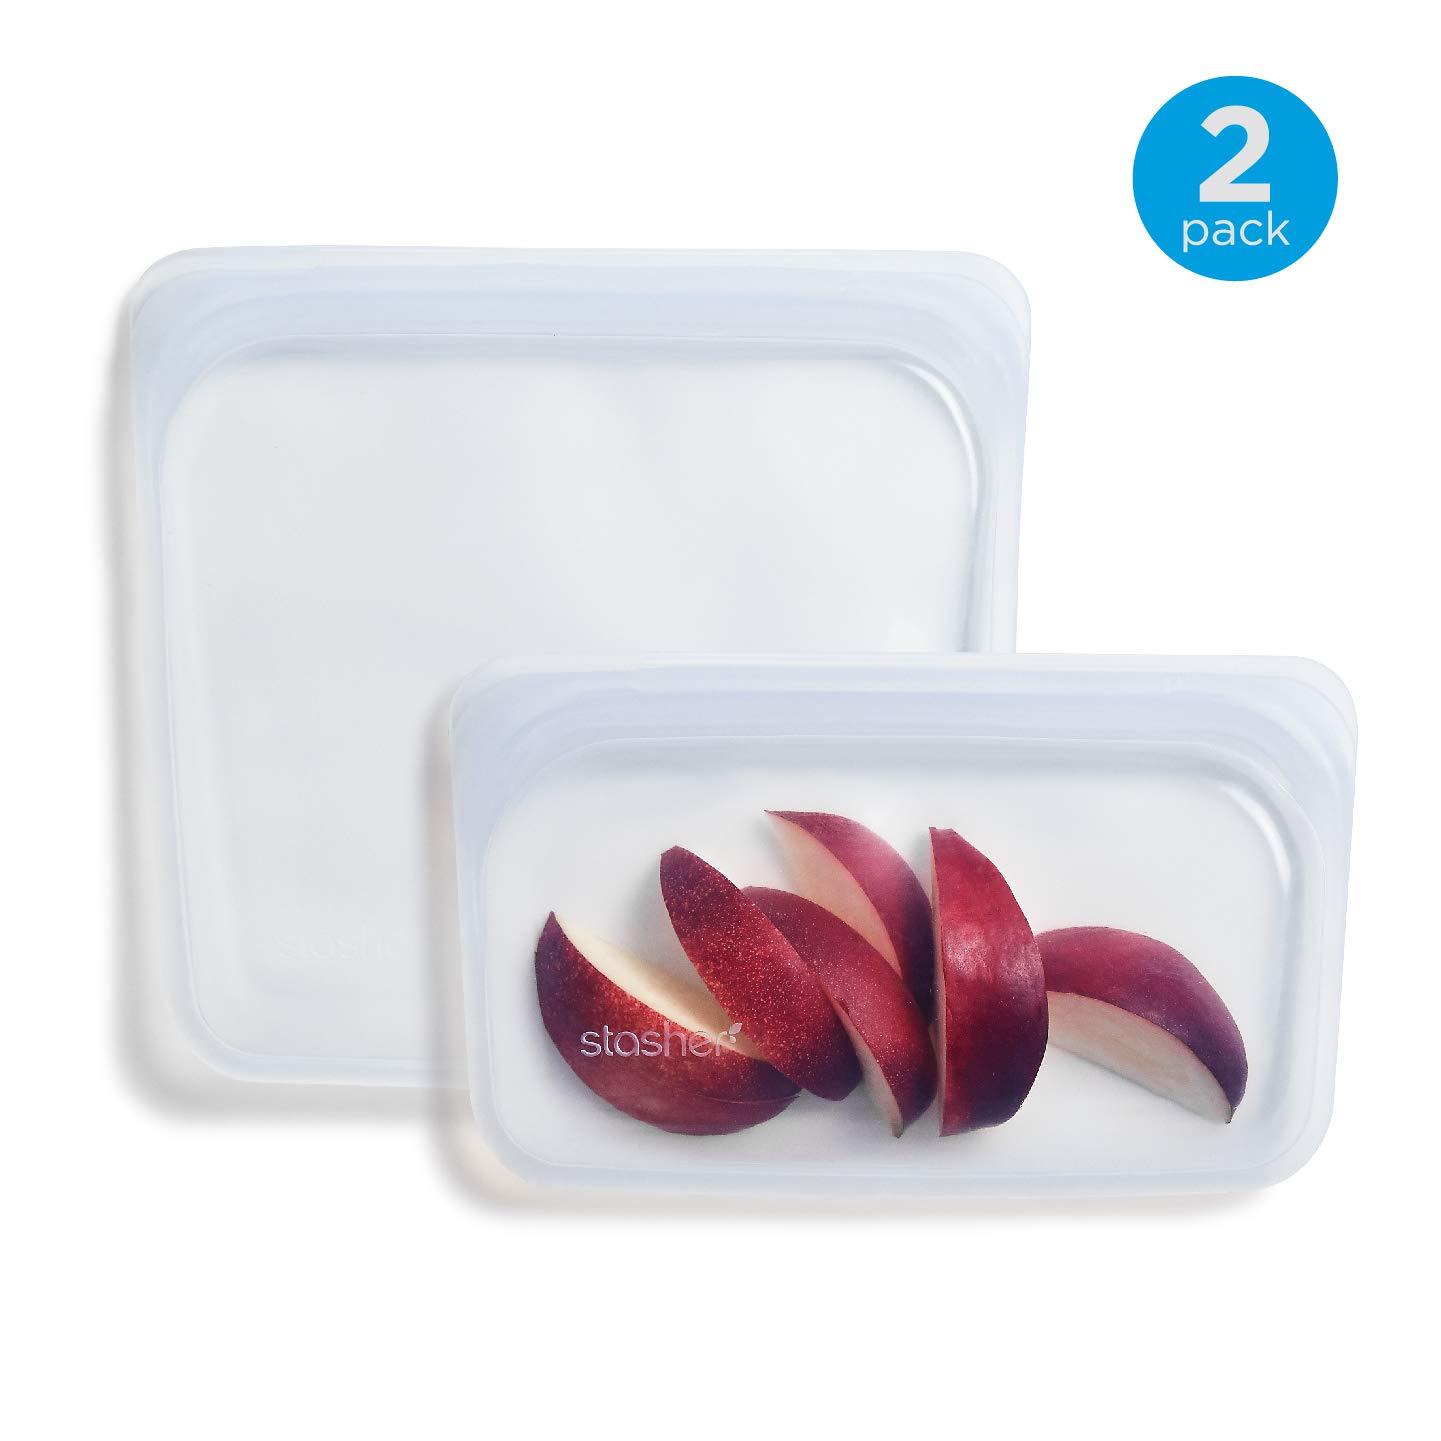 Stasher Reusable Silicone Food Bag, Sandwich Bag and Snack Bag, Storage Bag, Clear